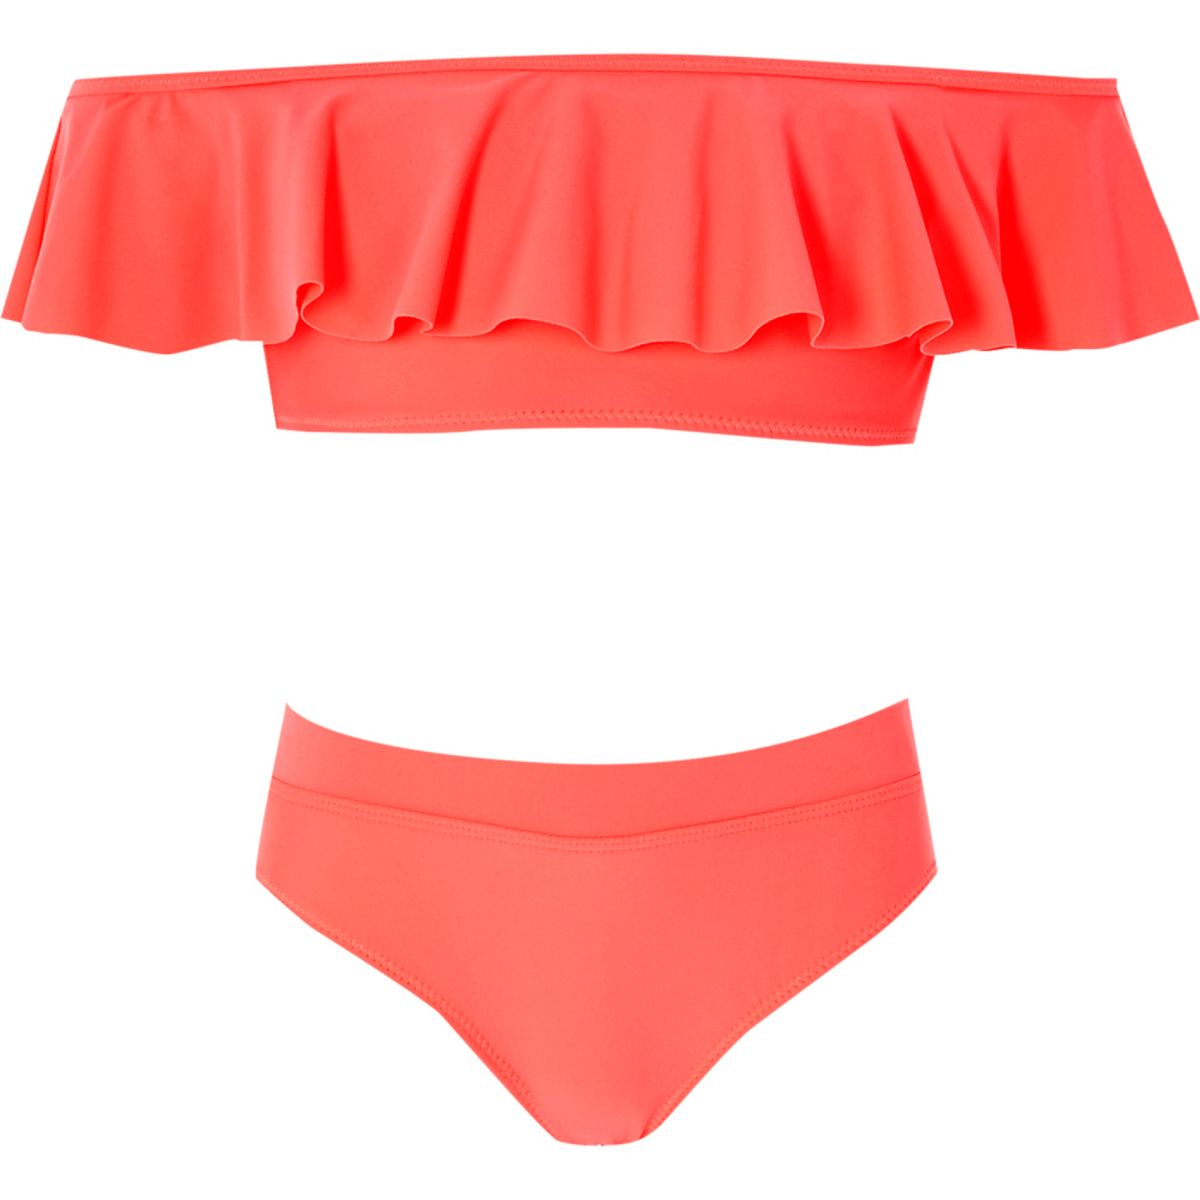 Bikini rose corail style Bardot avec volants pour fille